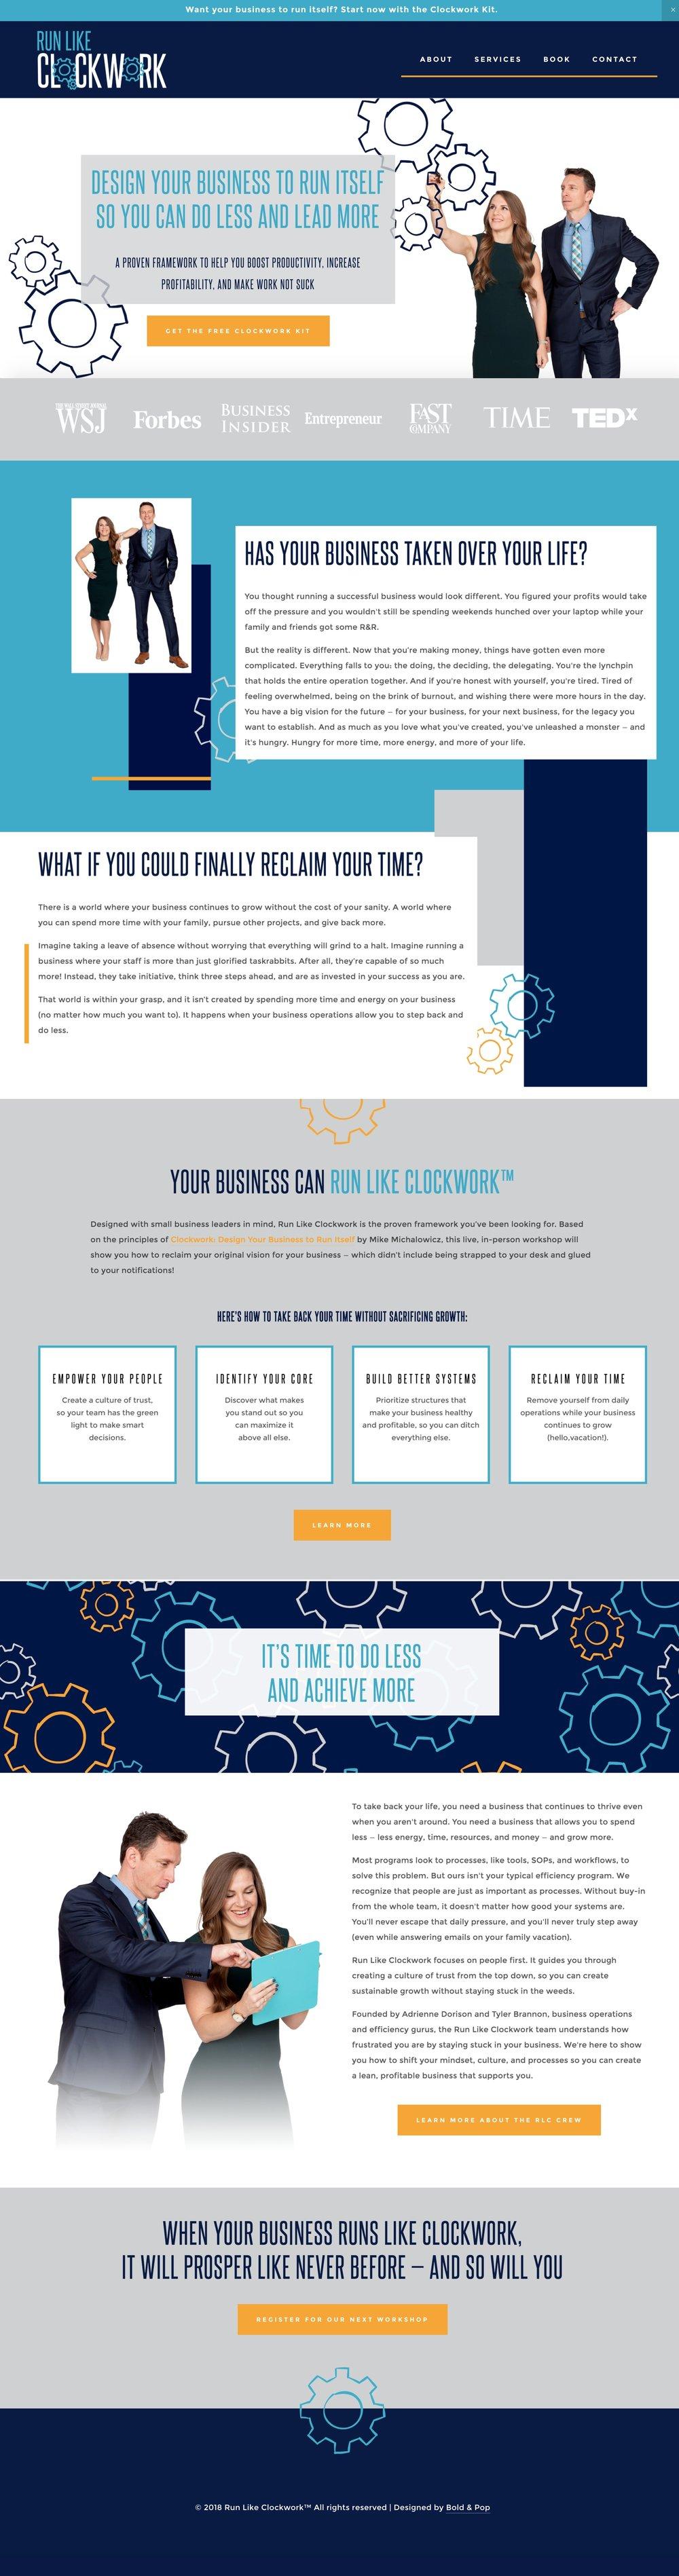 Professional Services Branding & Website Design